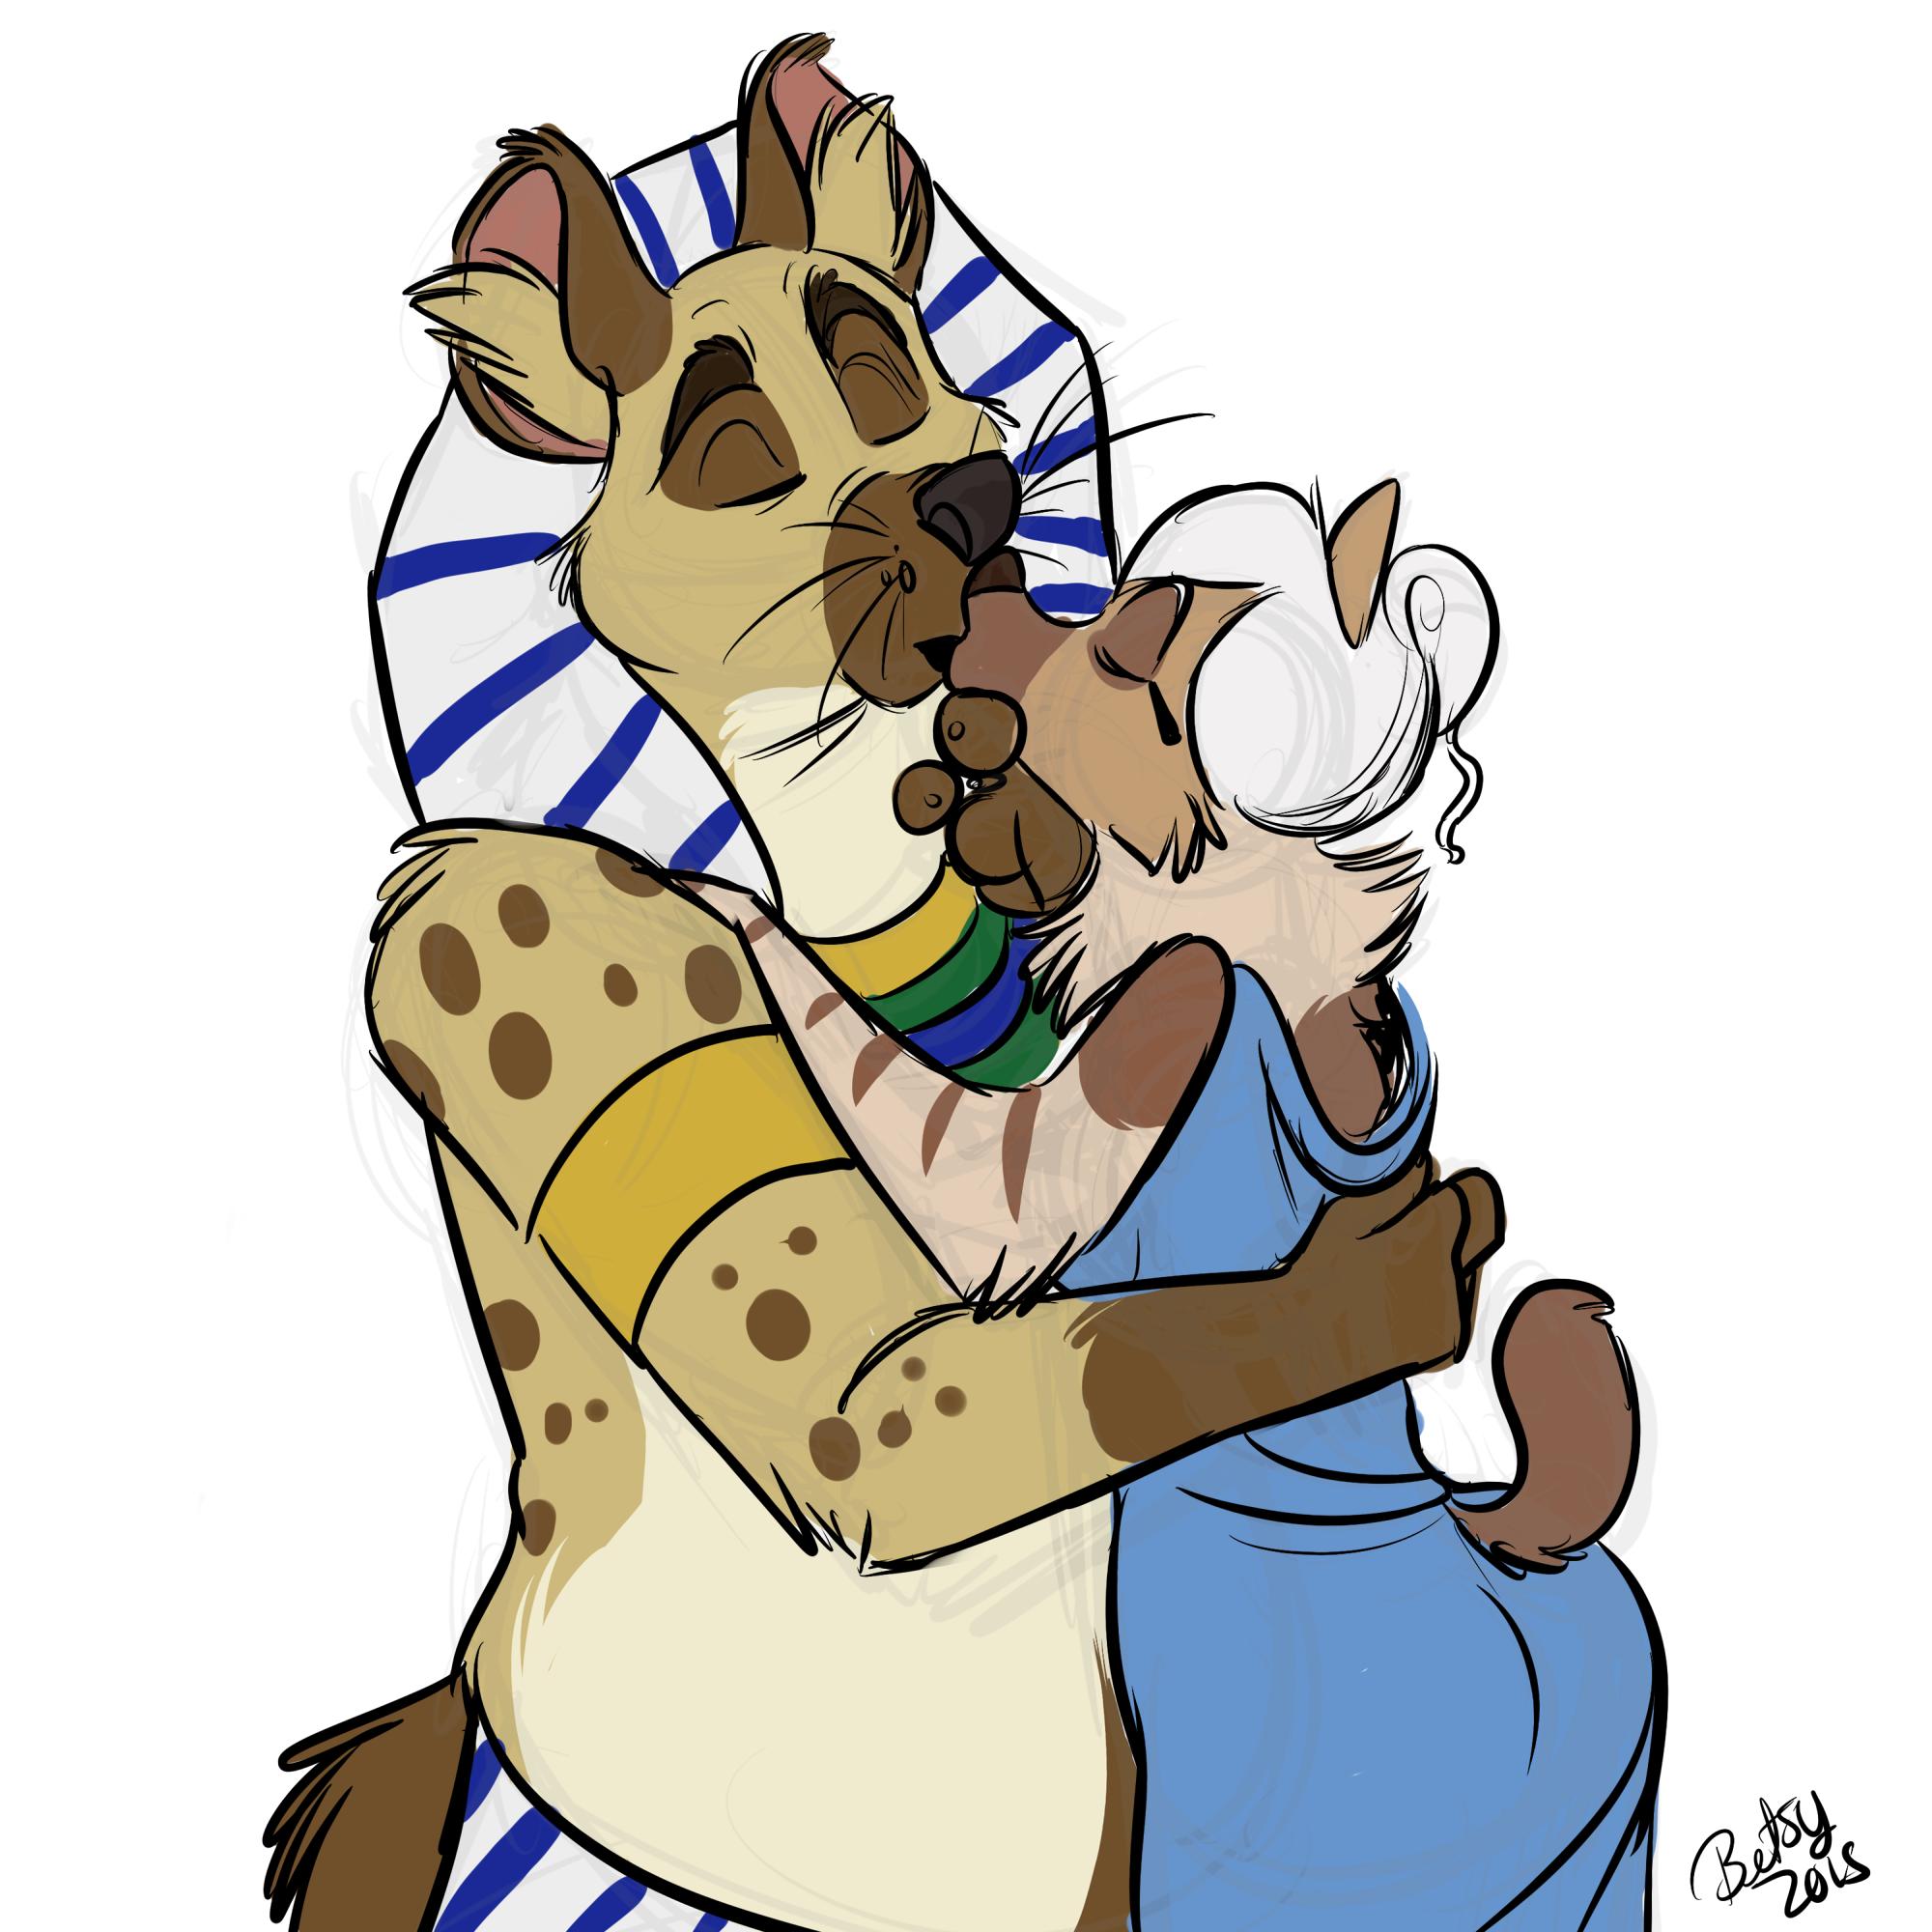 hyena_1-18-15